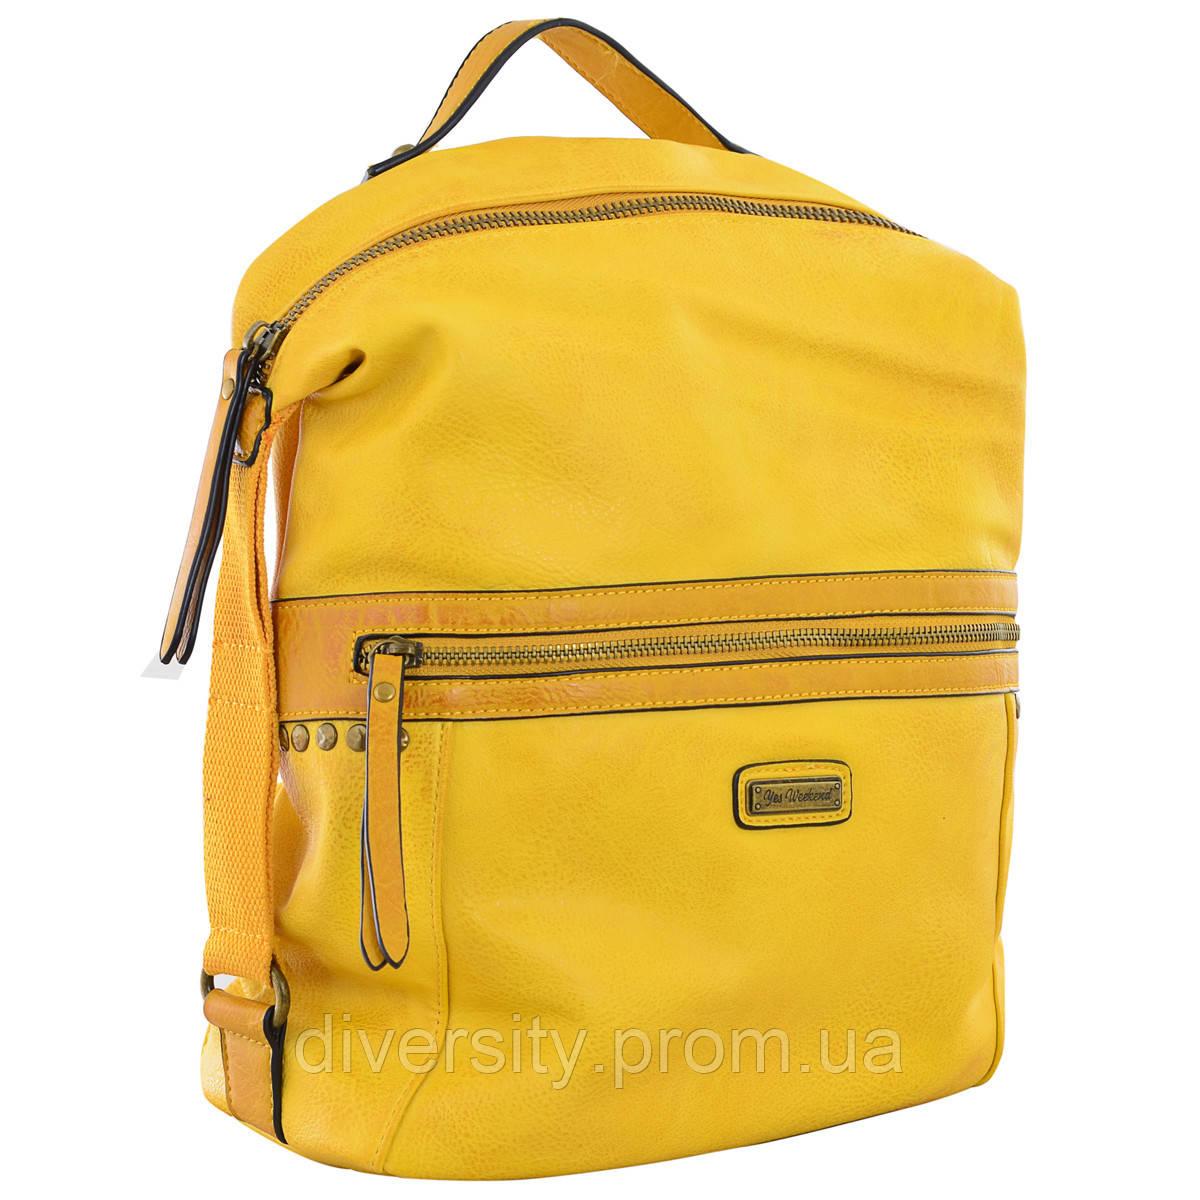 Молодежный рюкзак YES YW-20,  26*35*13.5,  желтый